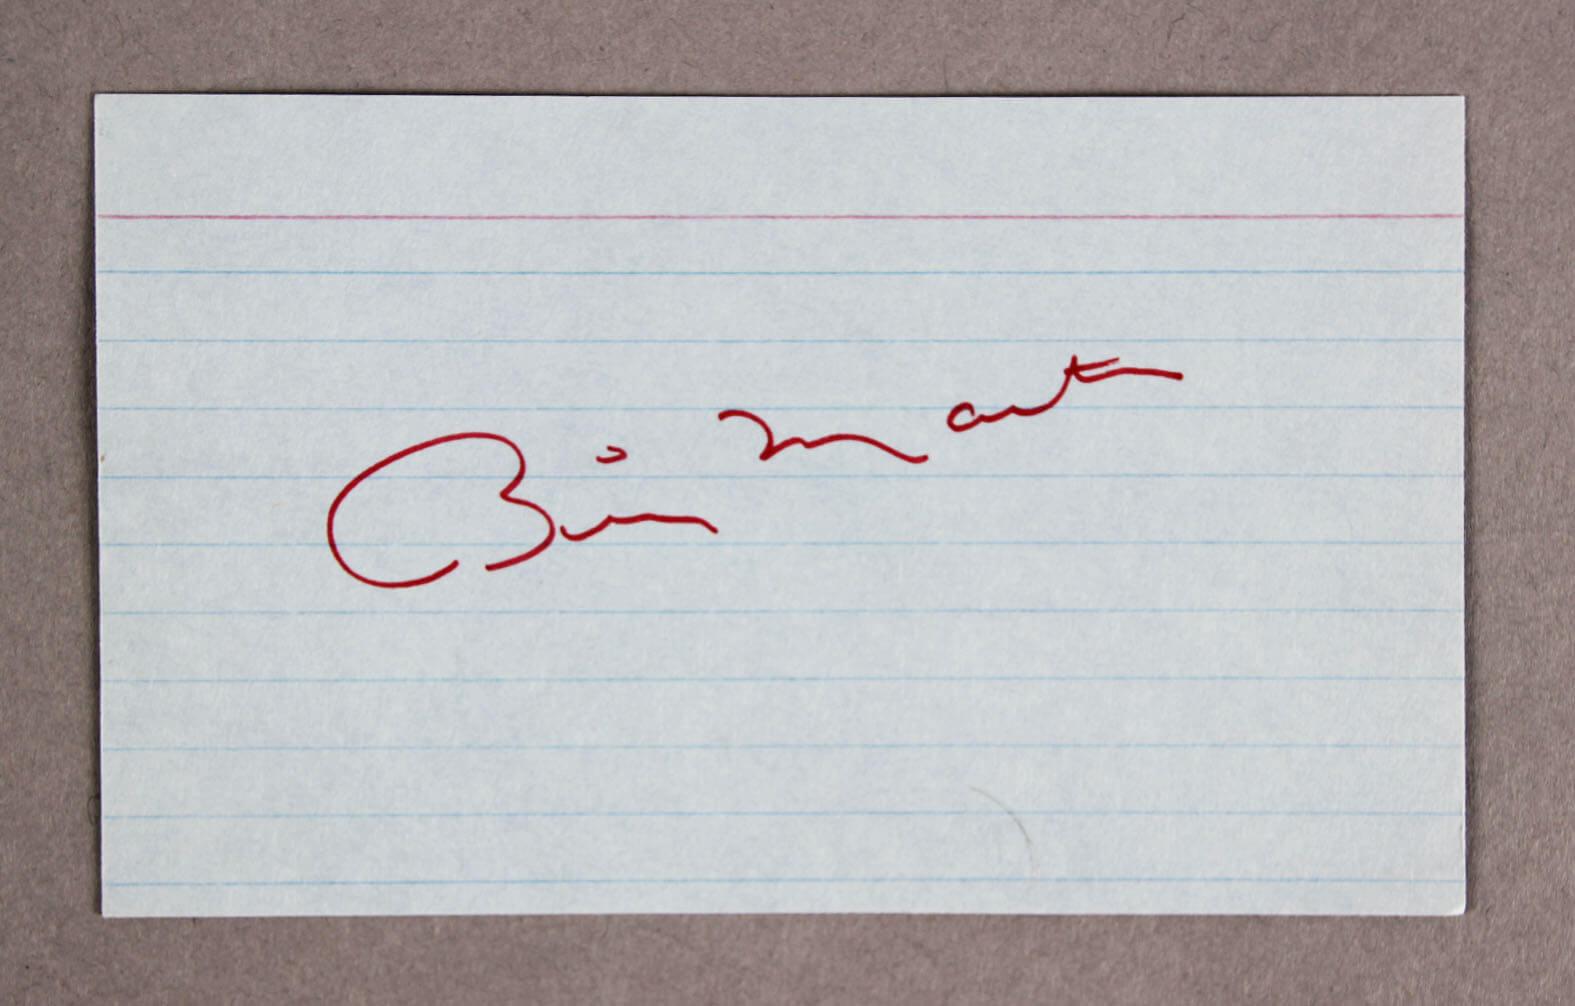 Billy Martin Signed Index Card Yankees - COA JSA